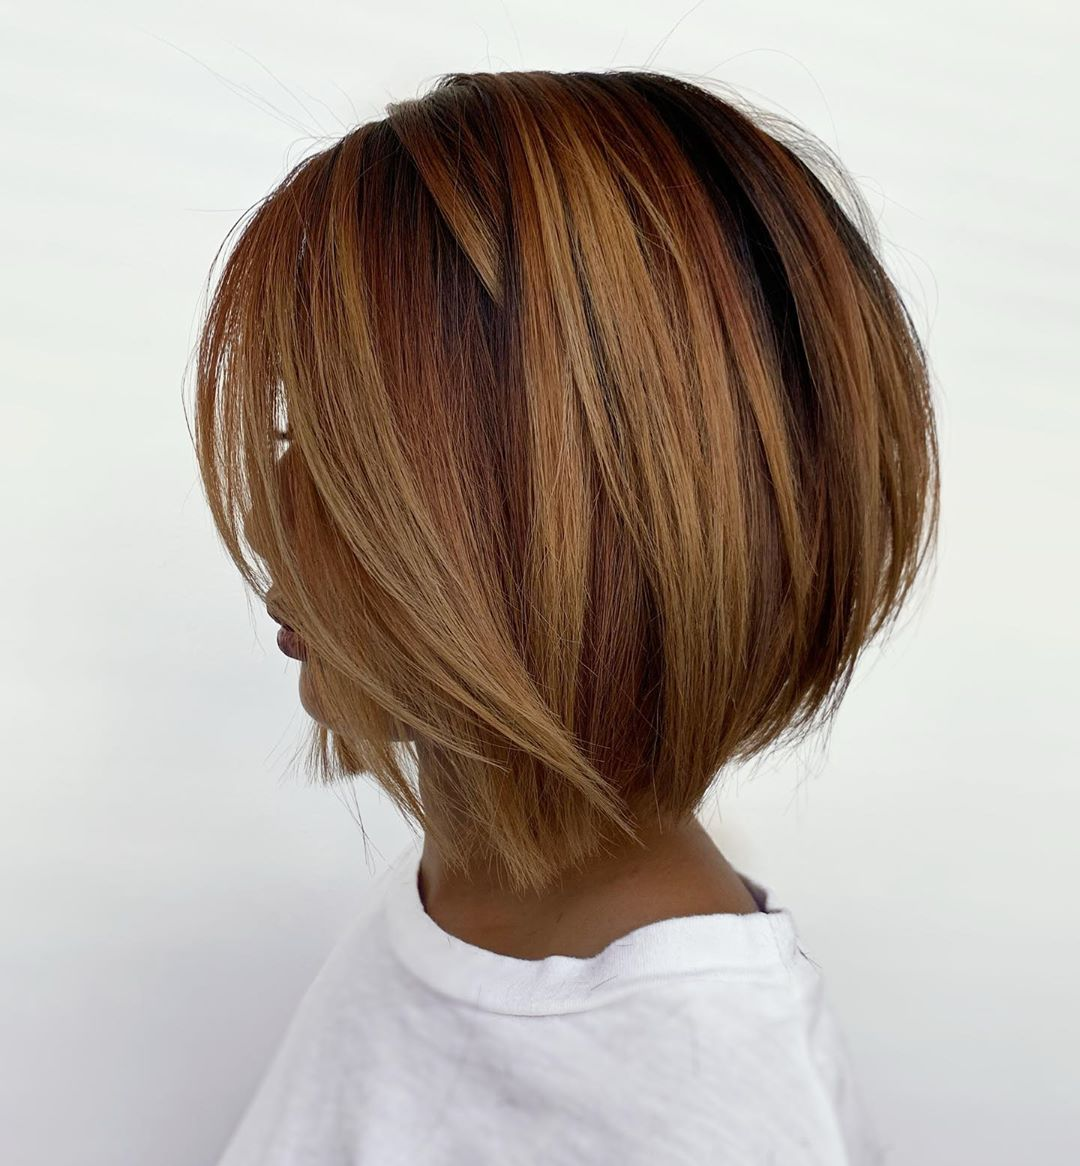 Мелирование на коротких волосах 2019-2020 фото 2